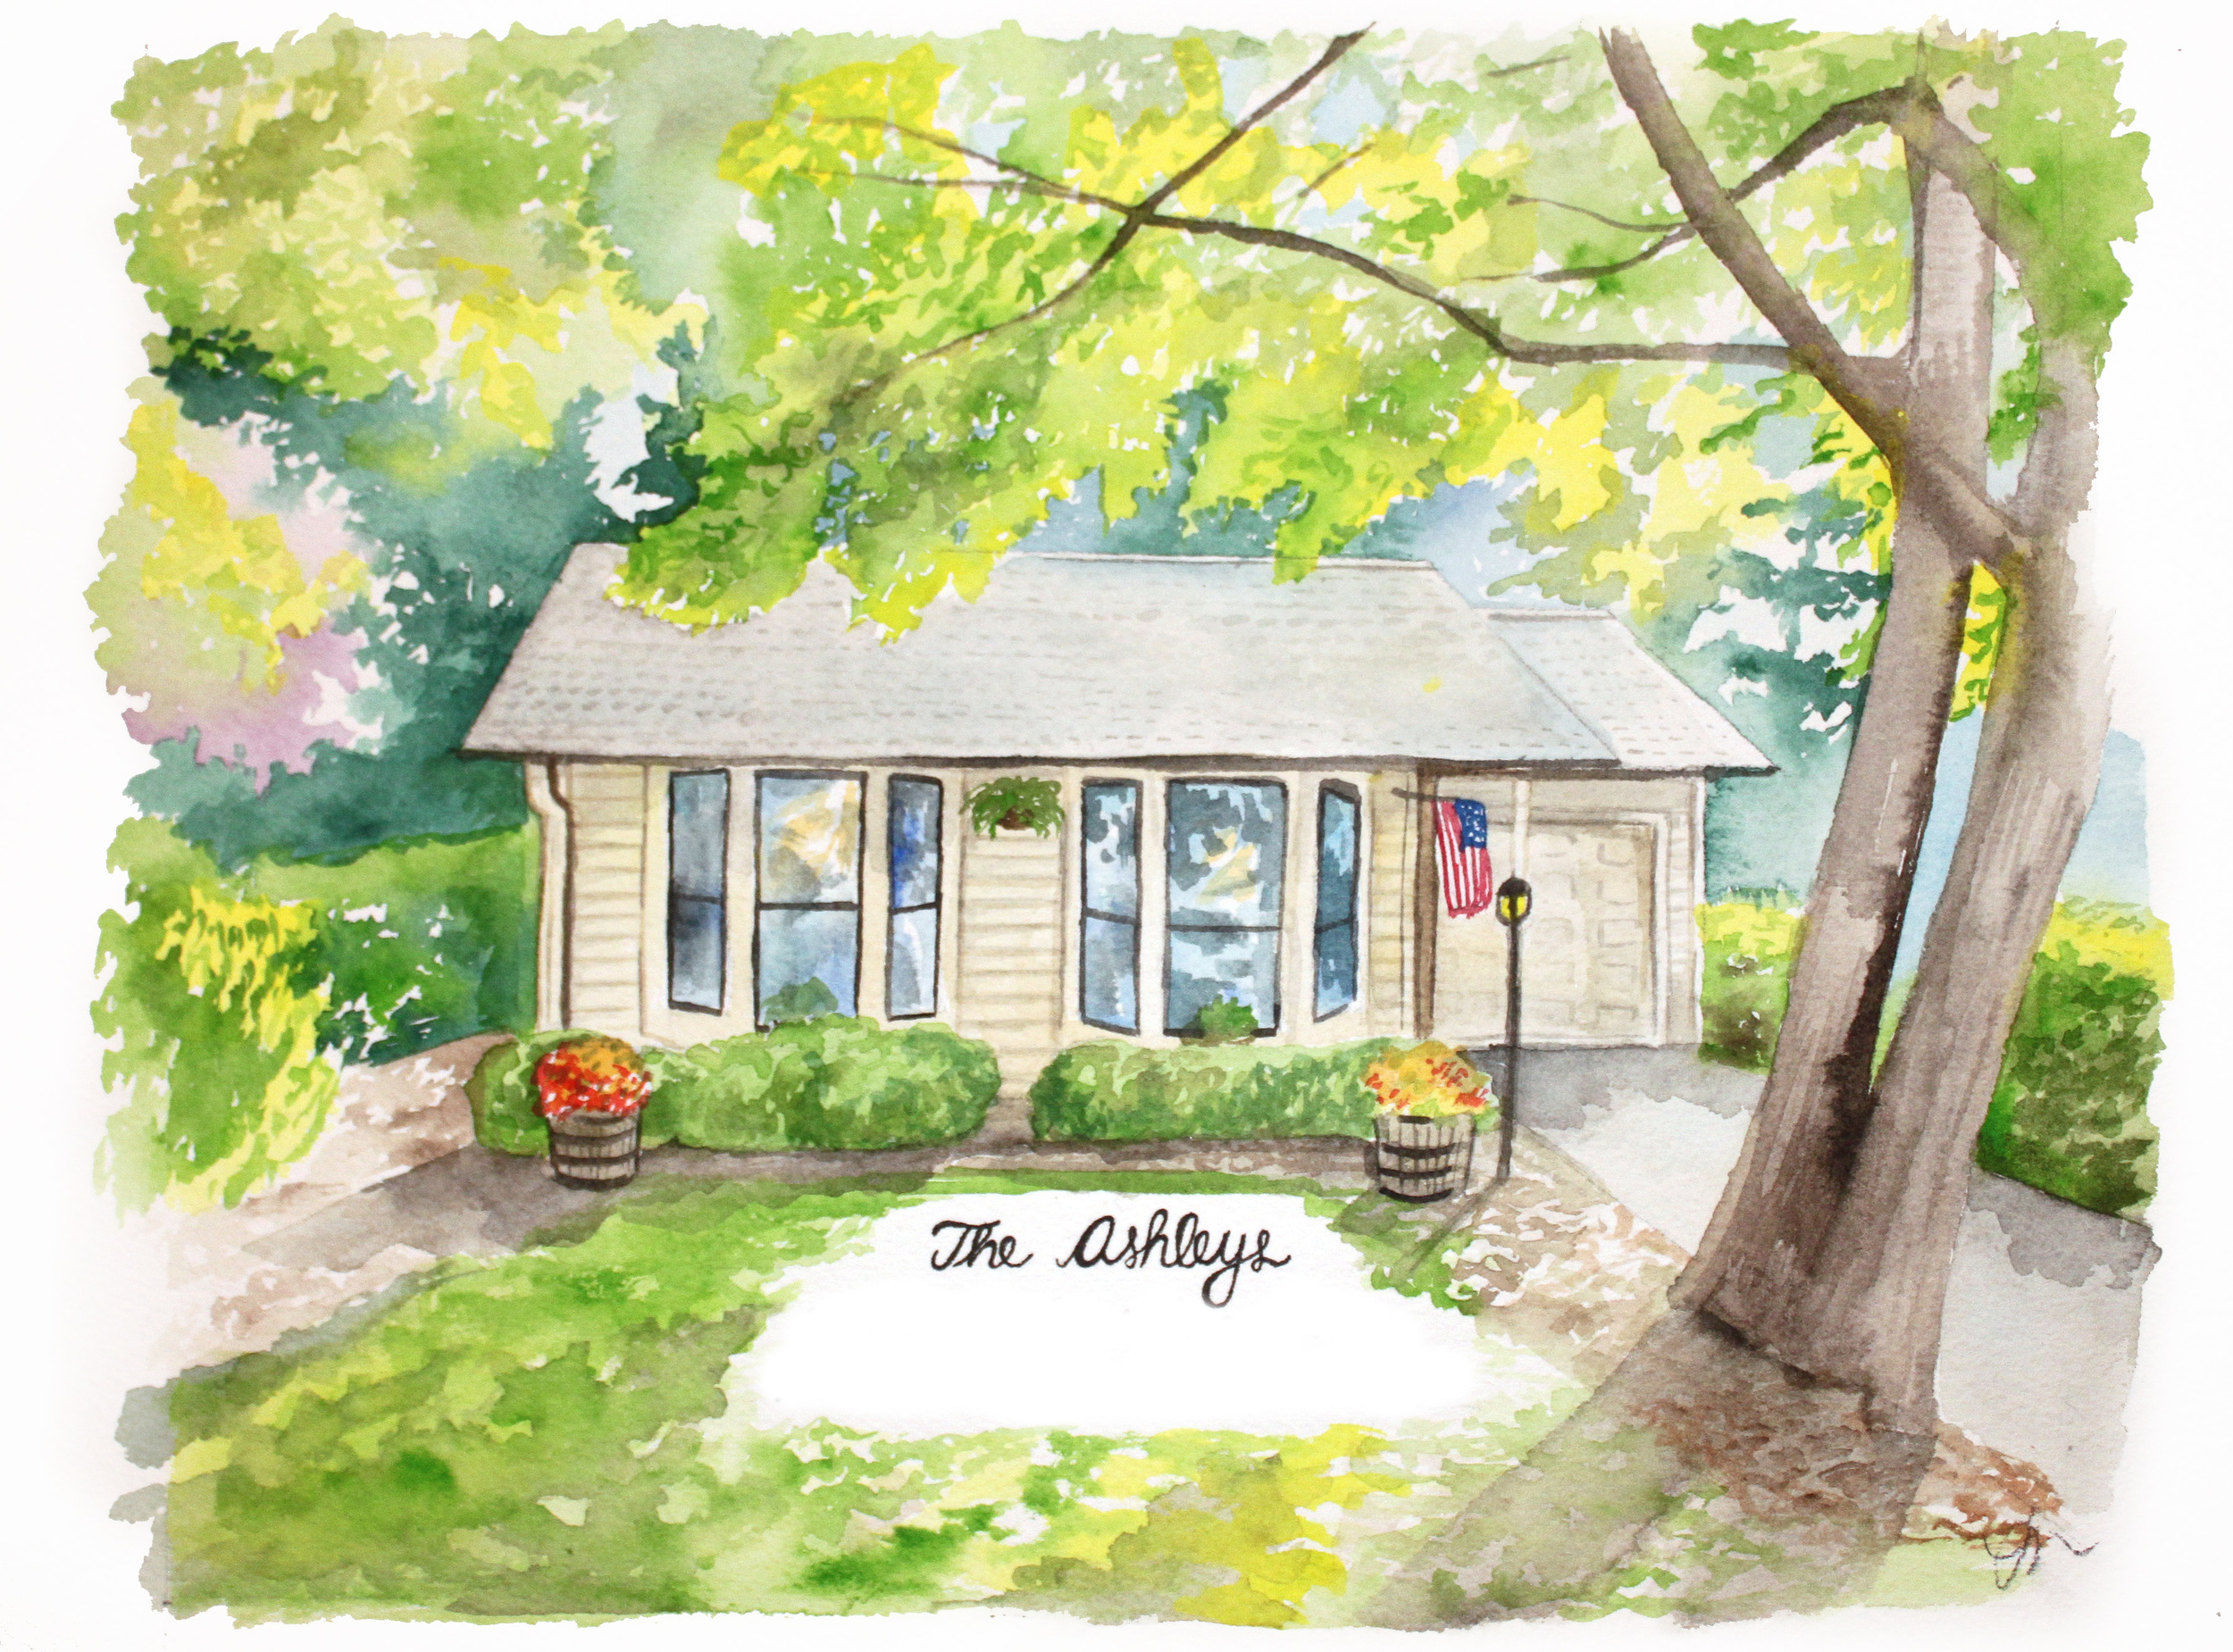 wc.2014.house.ashleys.jpg